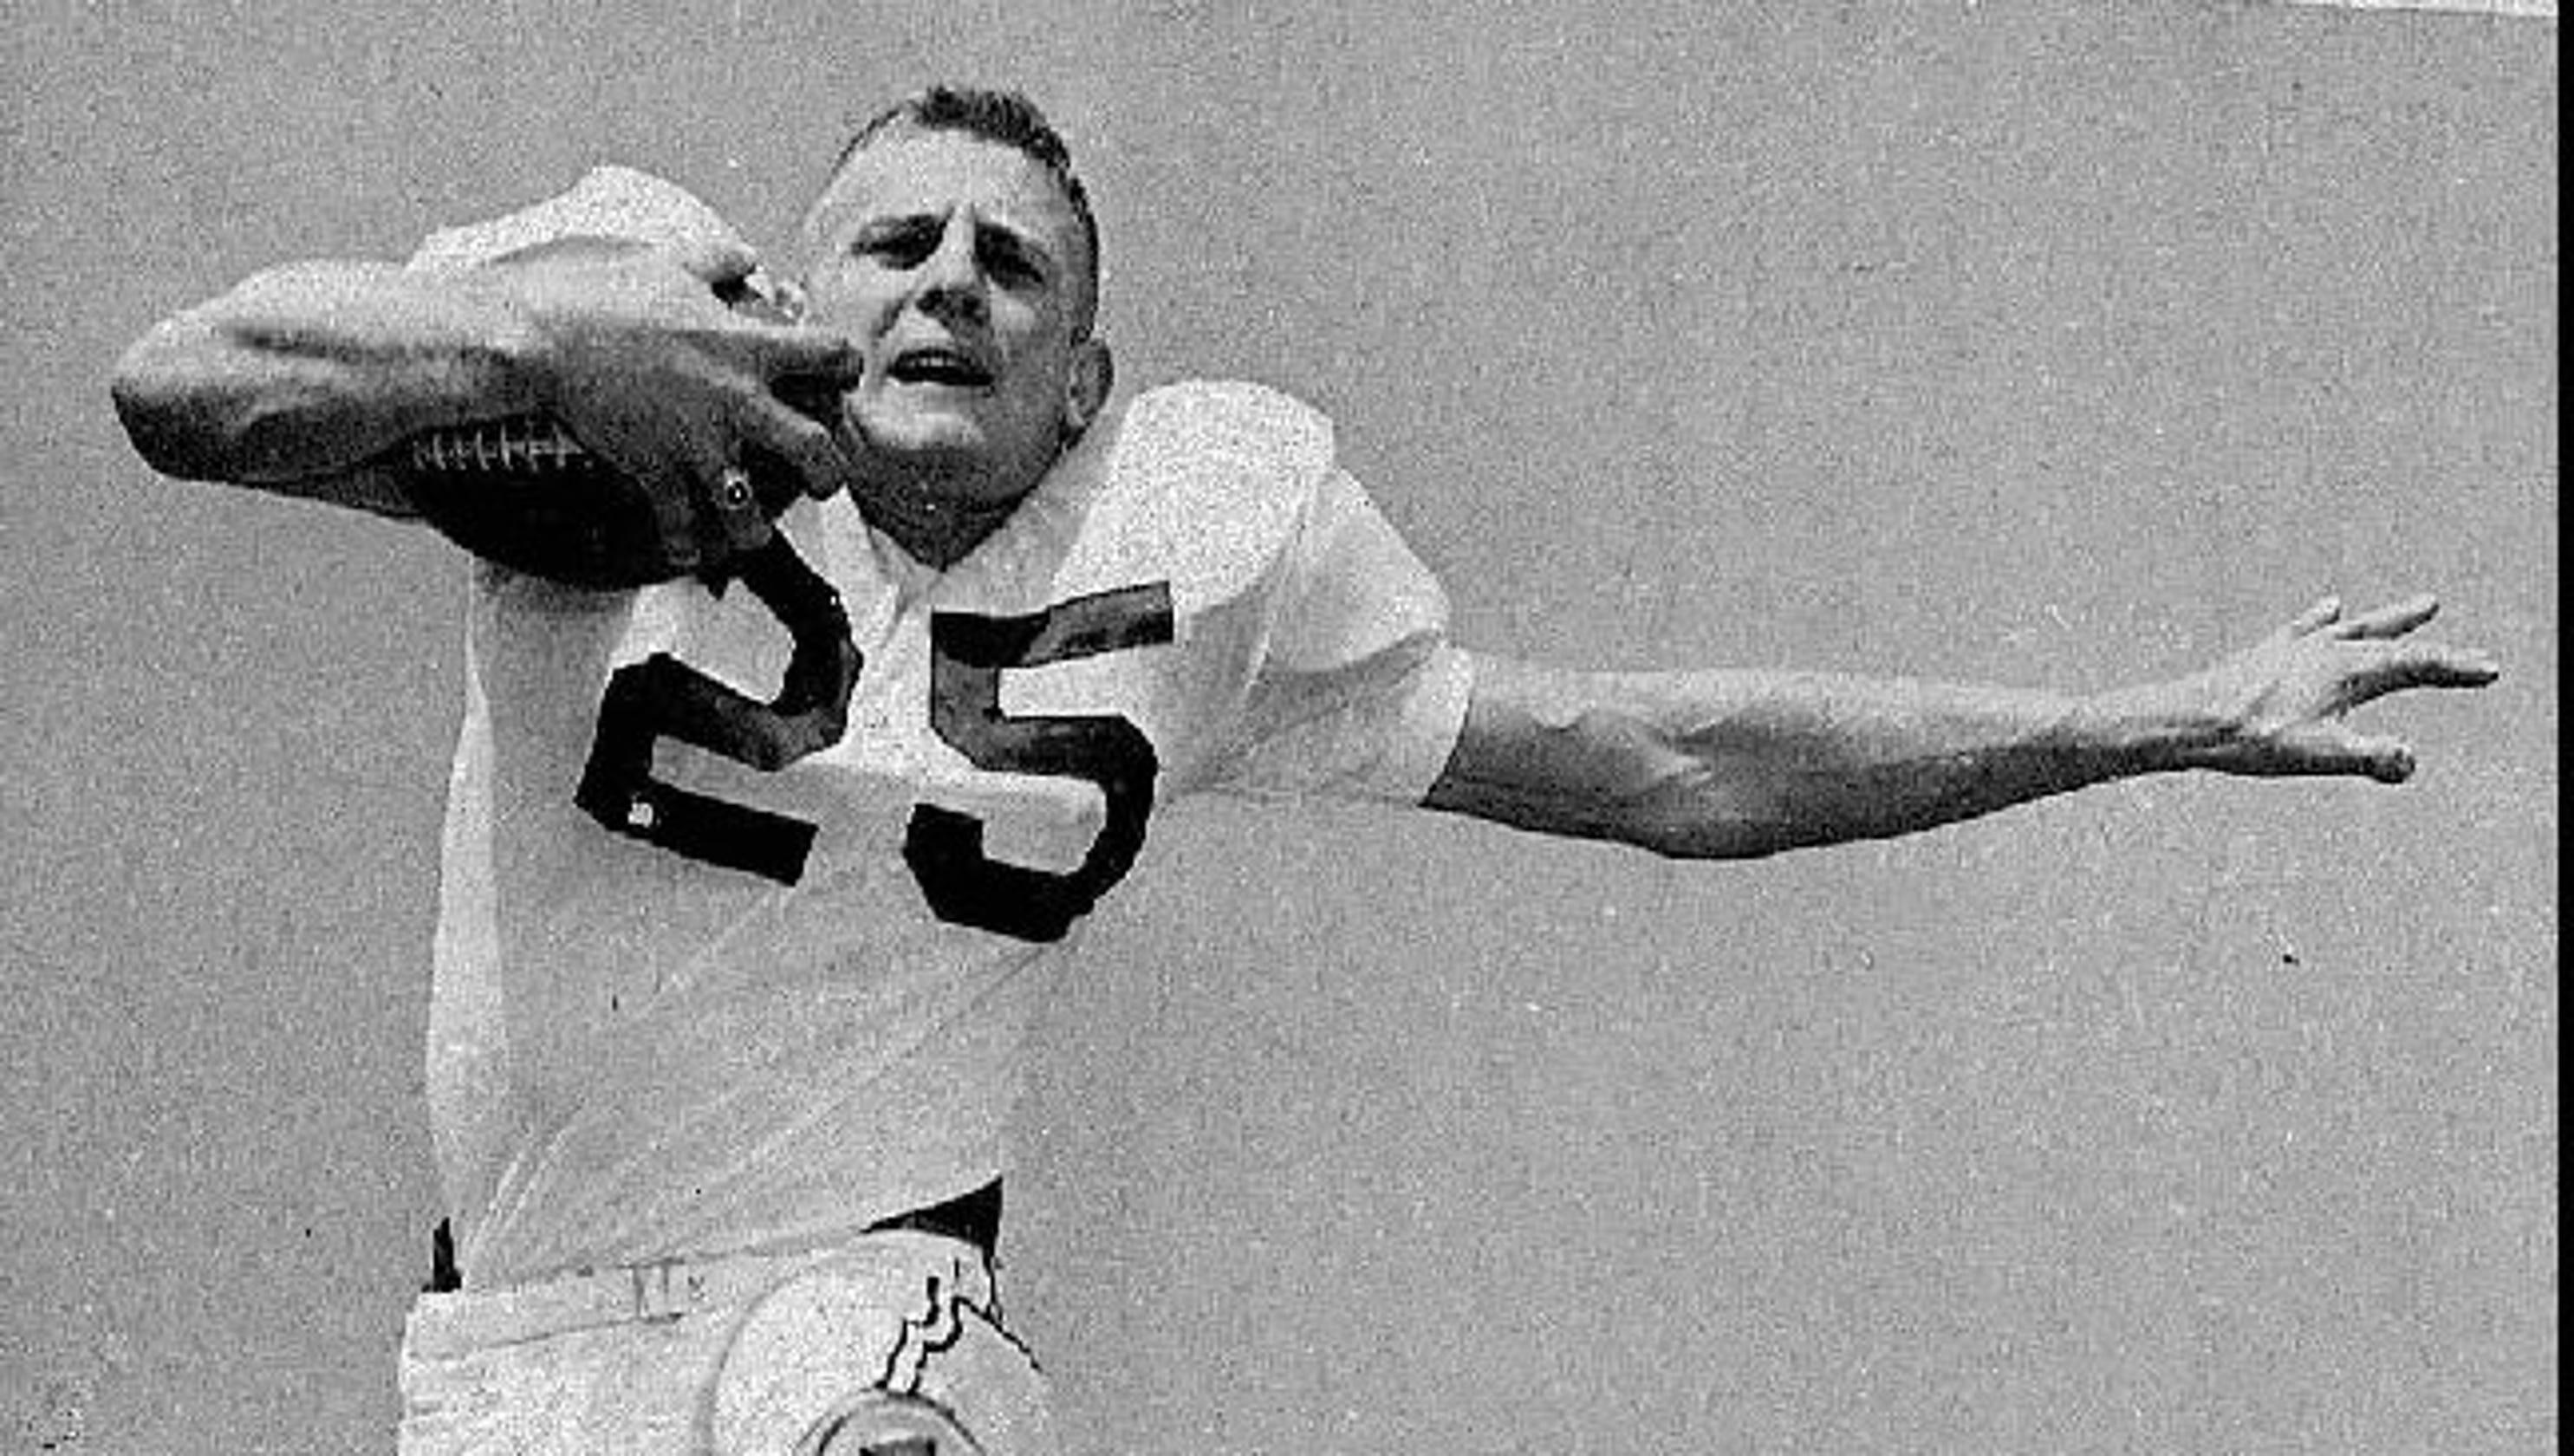 online retailer 1b1cc d90db Eagles' legend, Hall of Famer Tommy McDonald dies, 84